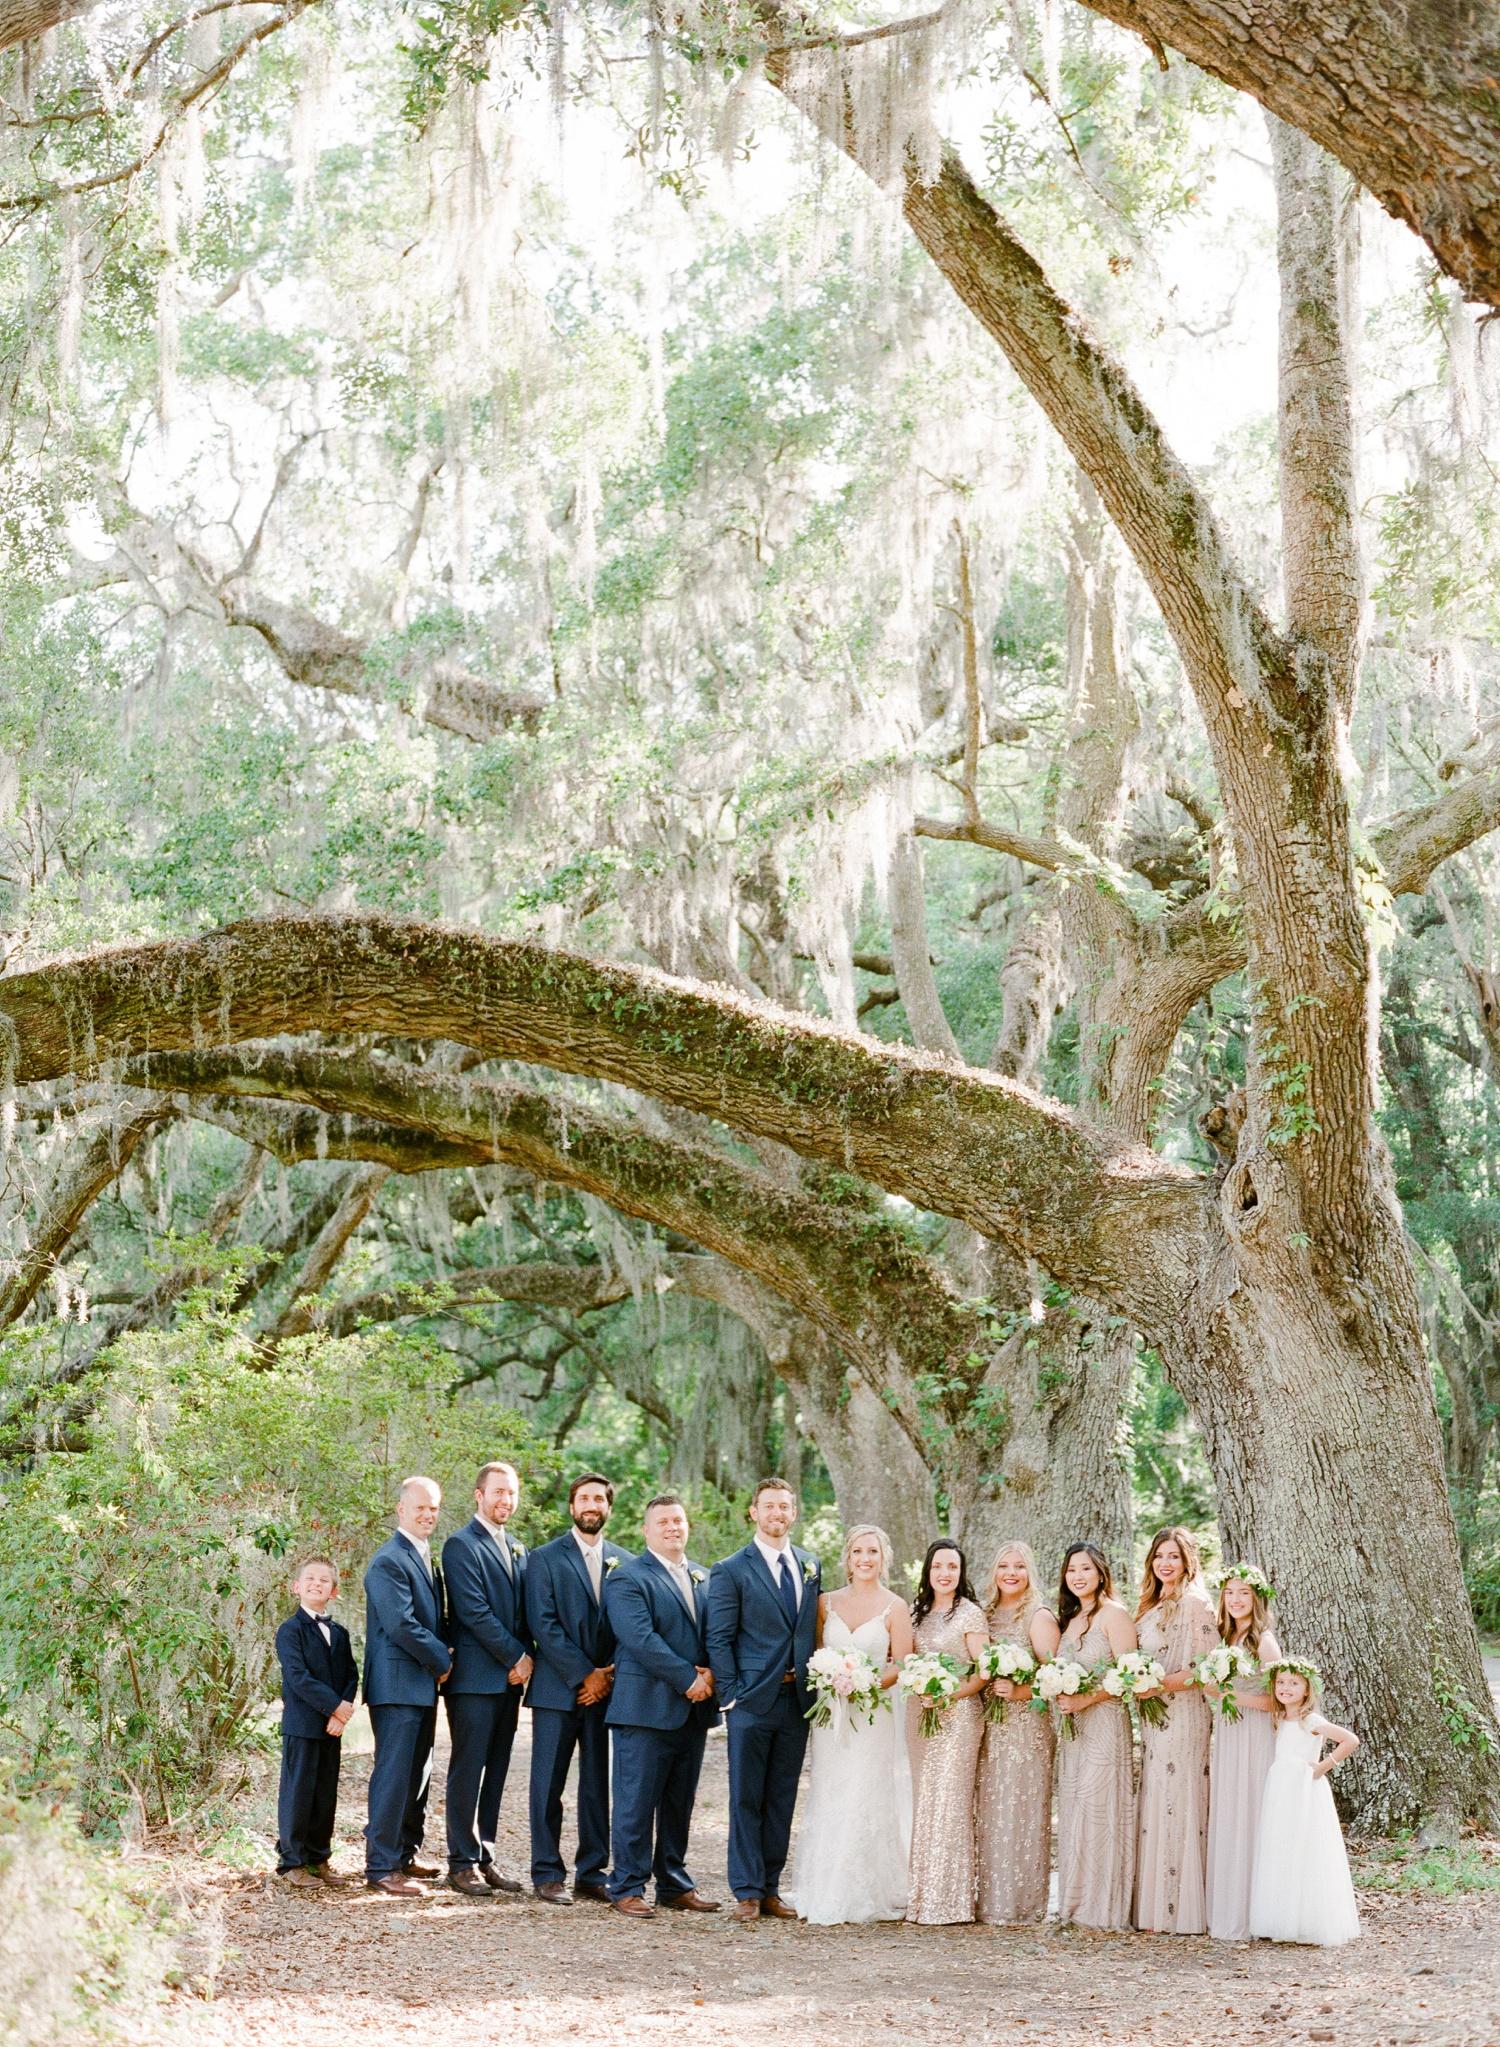 Magnolia-Garden-Southern-Weddings-Magazine_0025.jpg